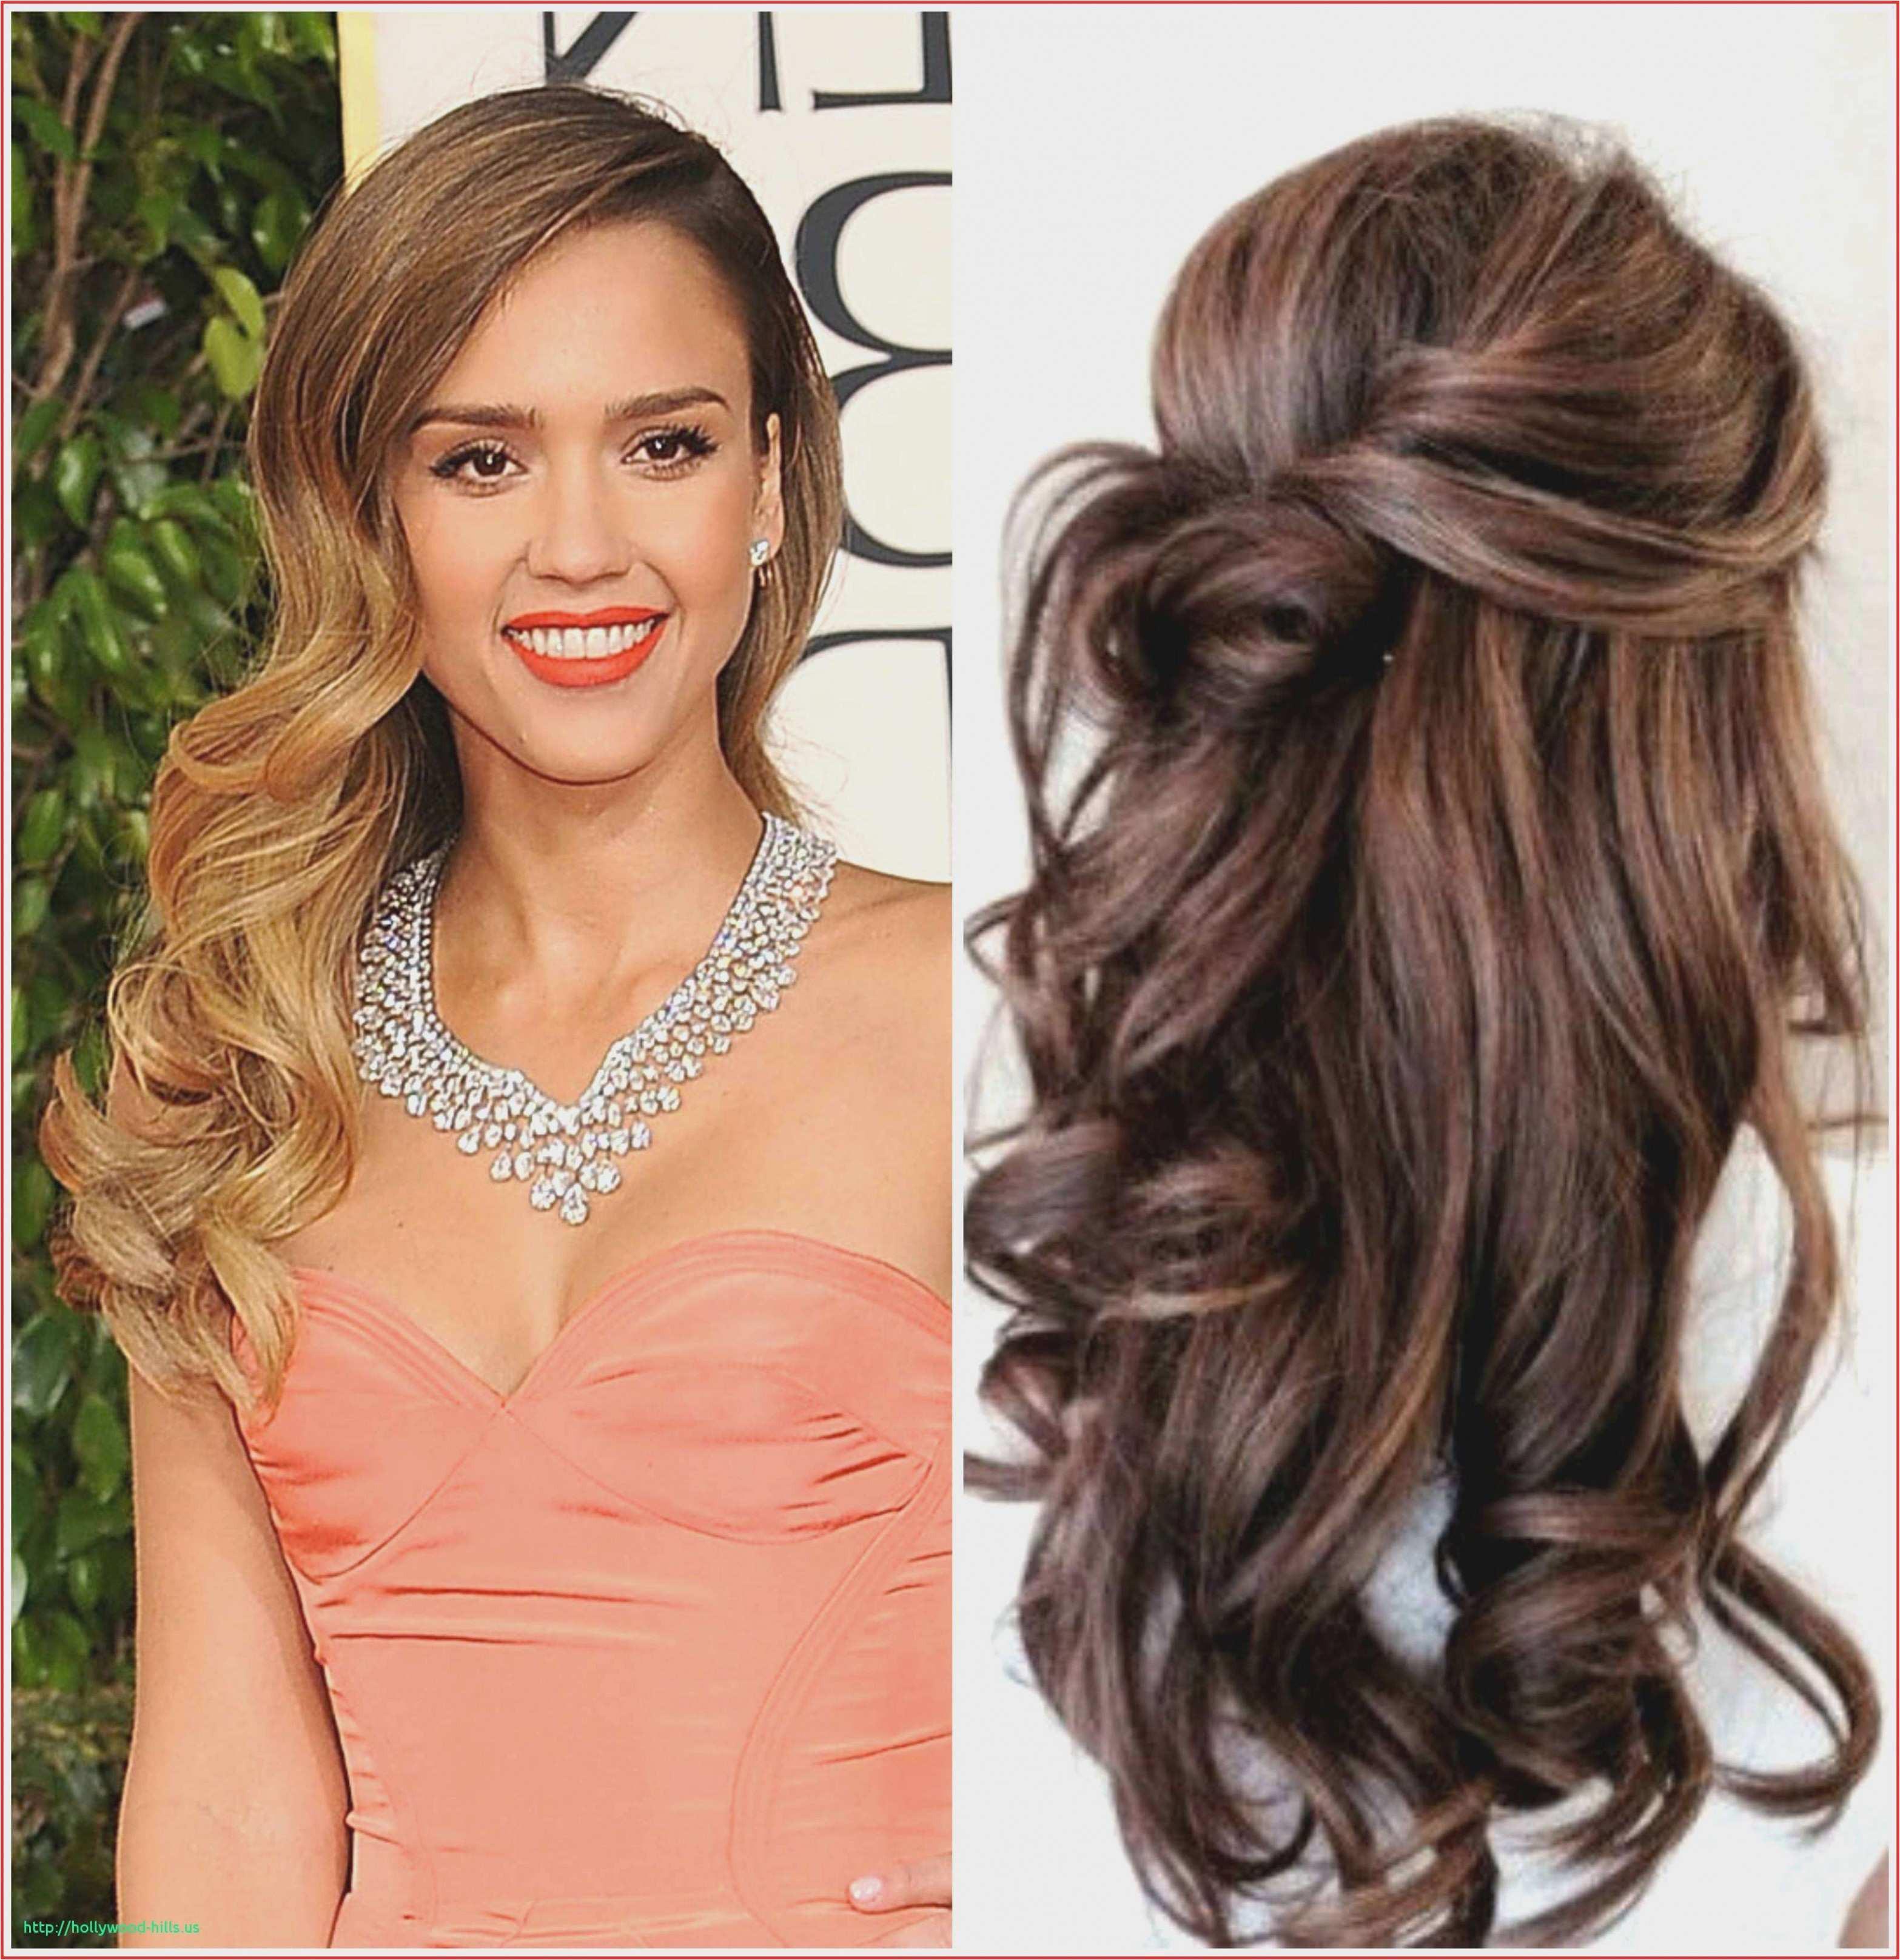 Hairstyles for Girls for Medium Hair New Fresh Simple Hairstyles for Girls with Medium Hair –